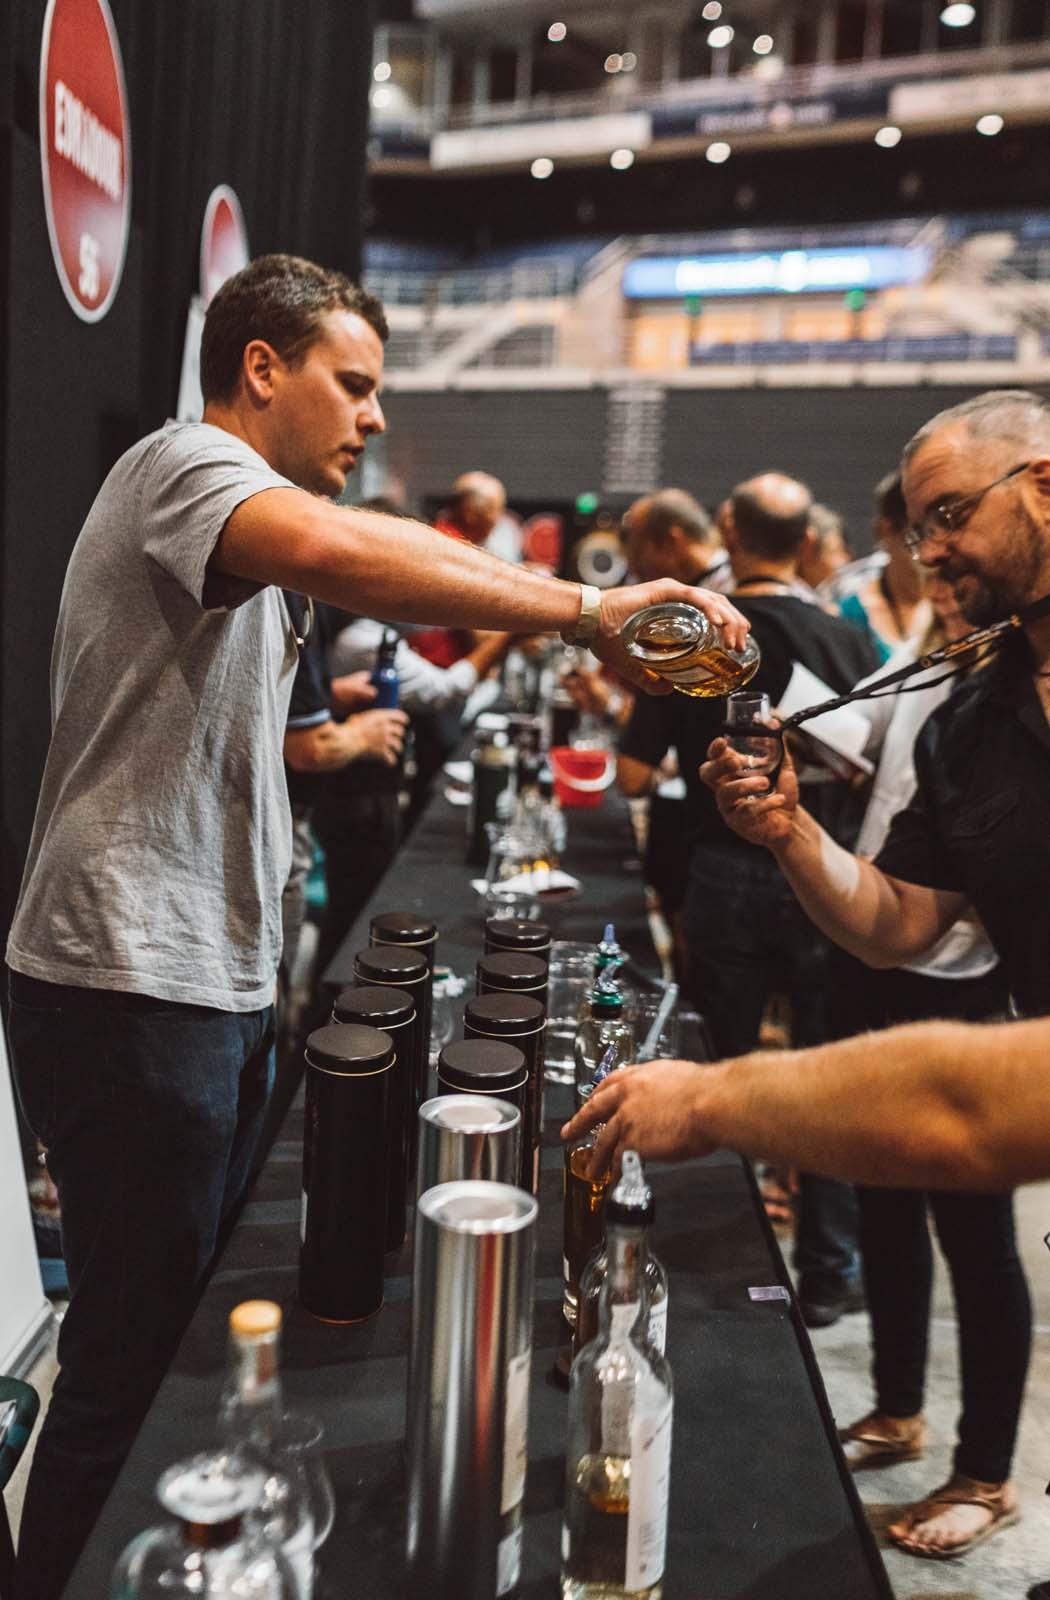 Dramfest 2018 for Whisky Galore-34.jpg